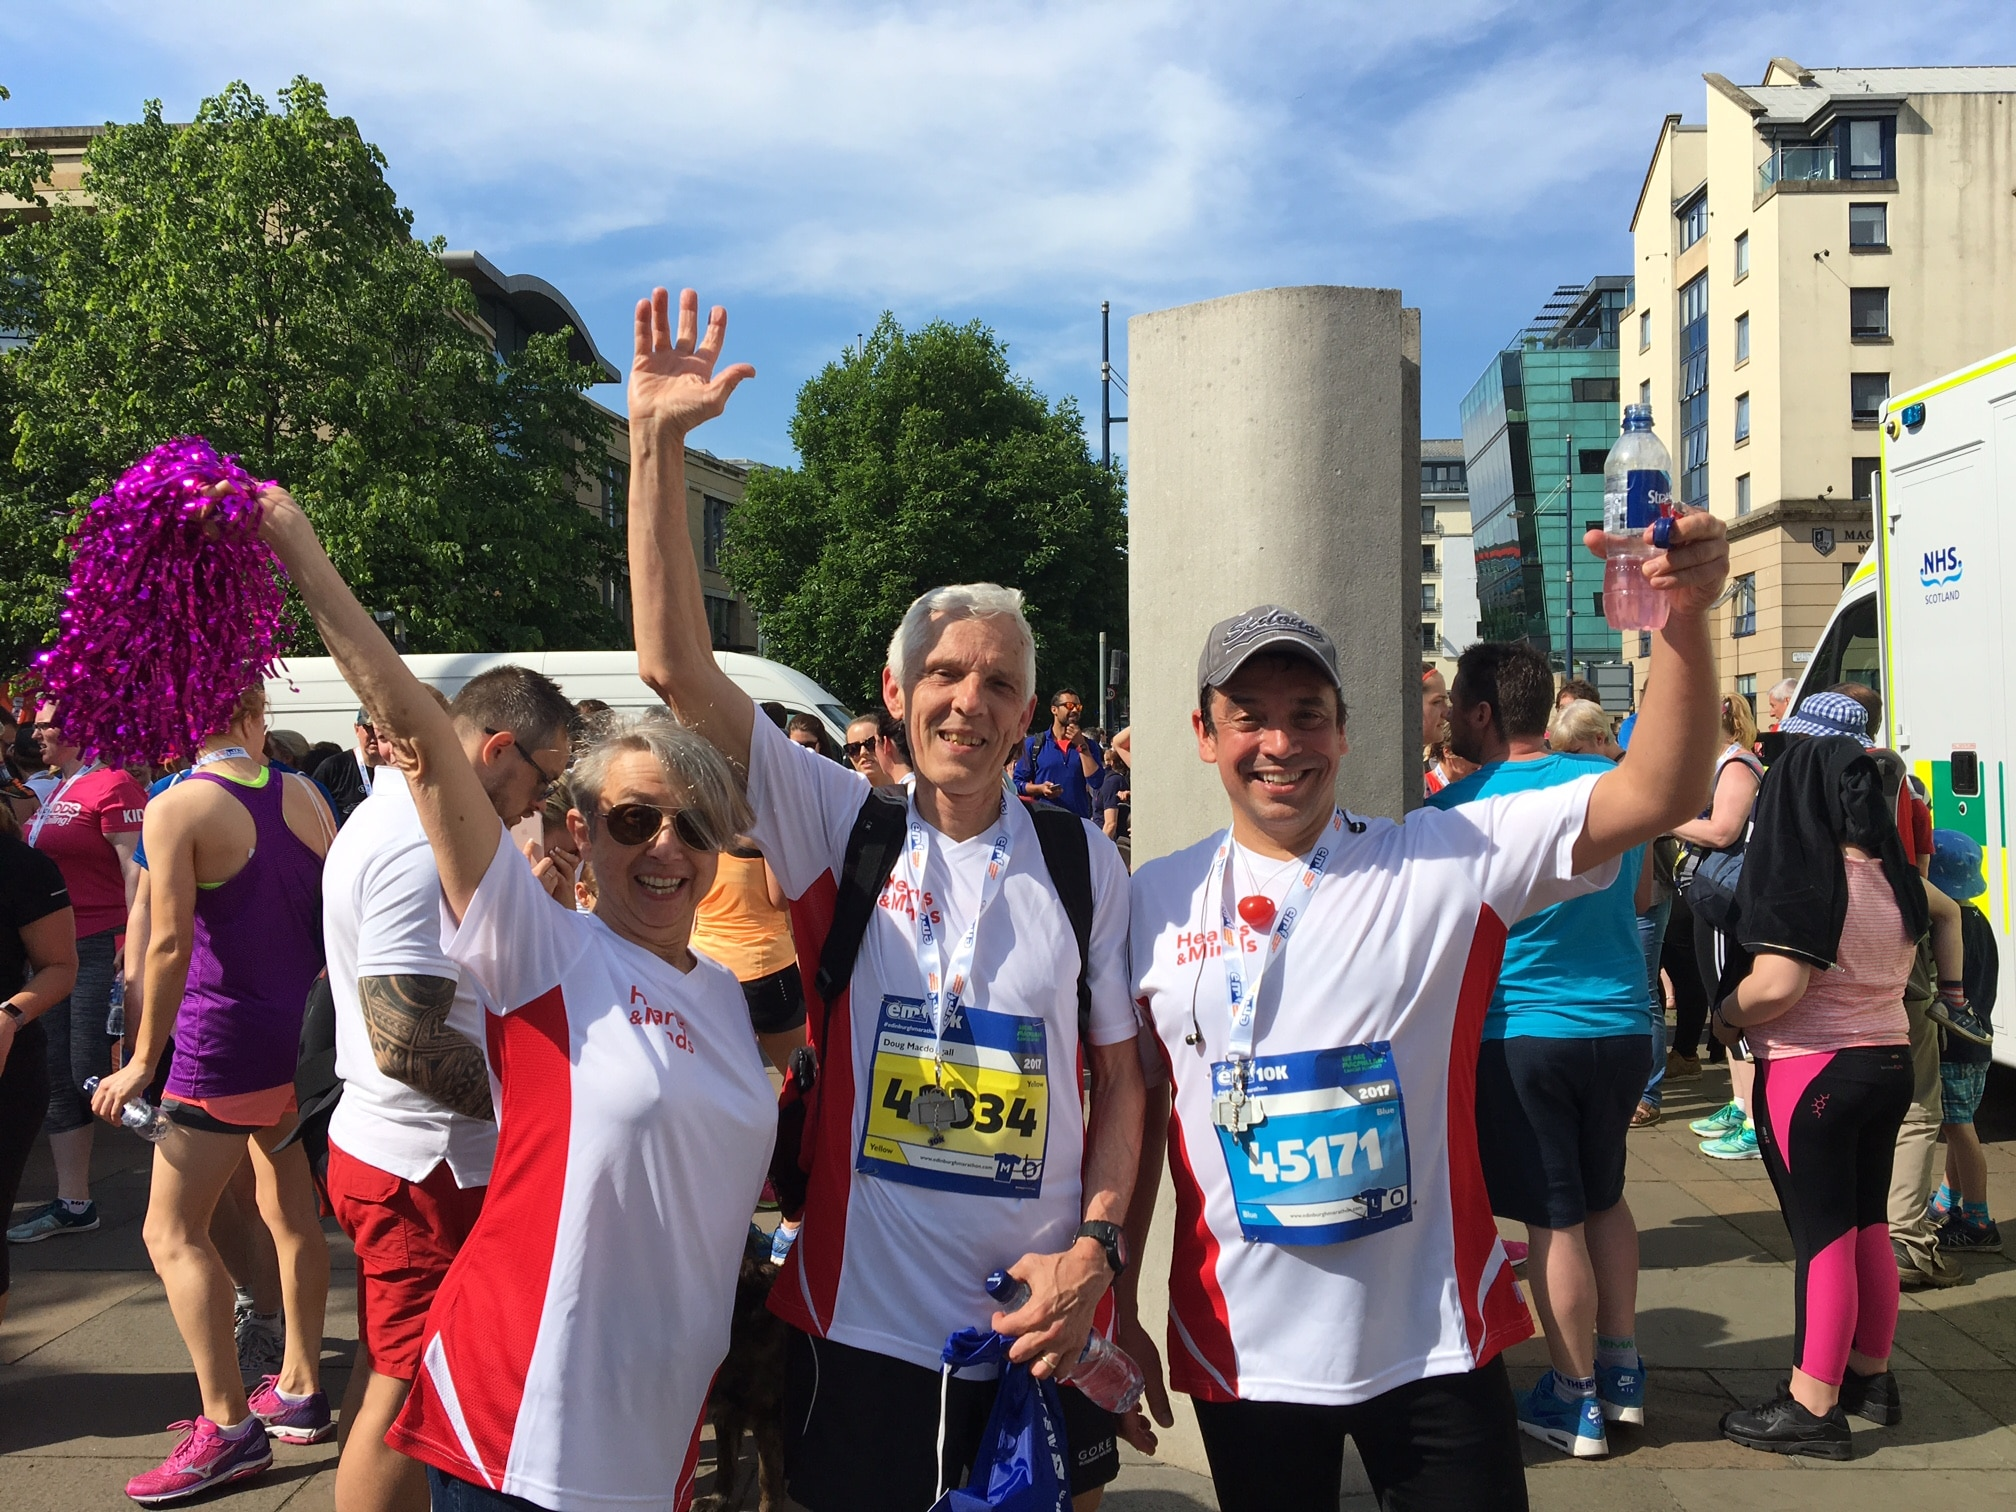 Participants in the Edinburgh 10k Run